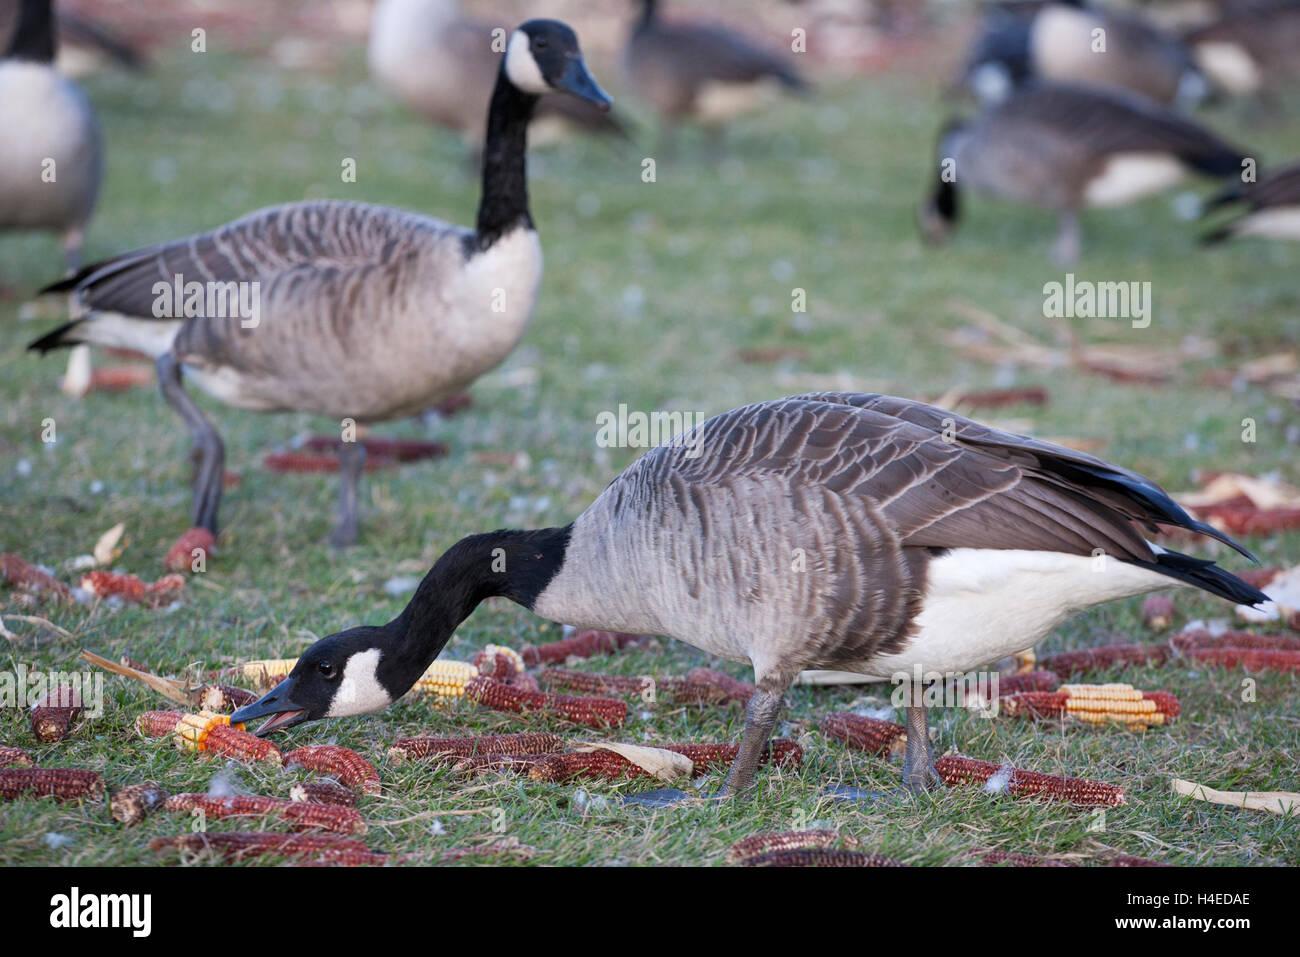 Canada goose (Branta canadensis) feeding on corn at the Upper Canada Migratory Bird Sanctuary - Stock Image